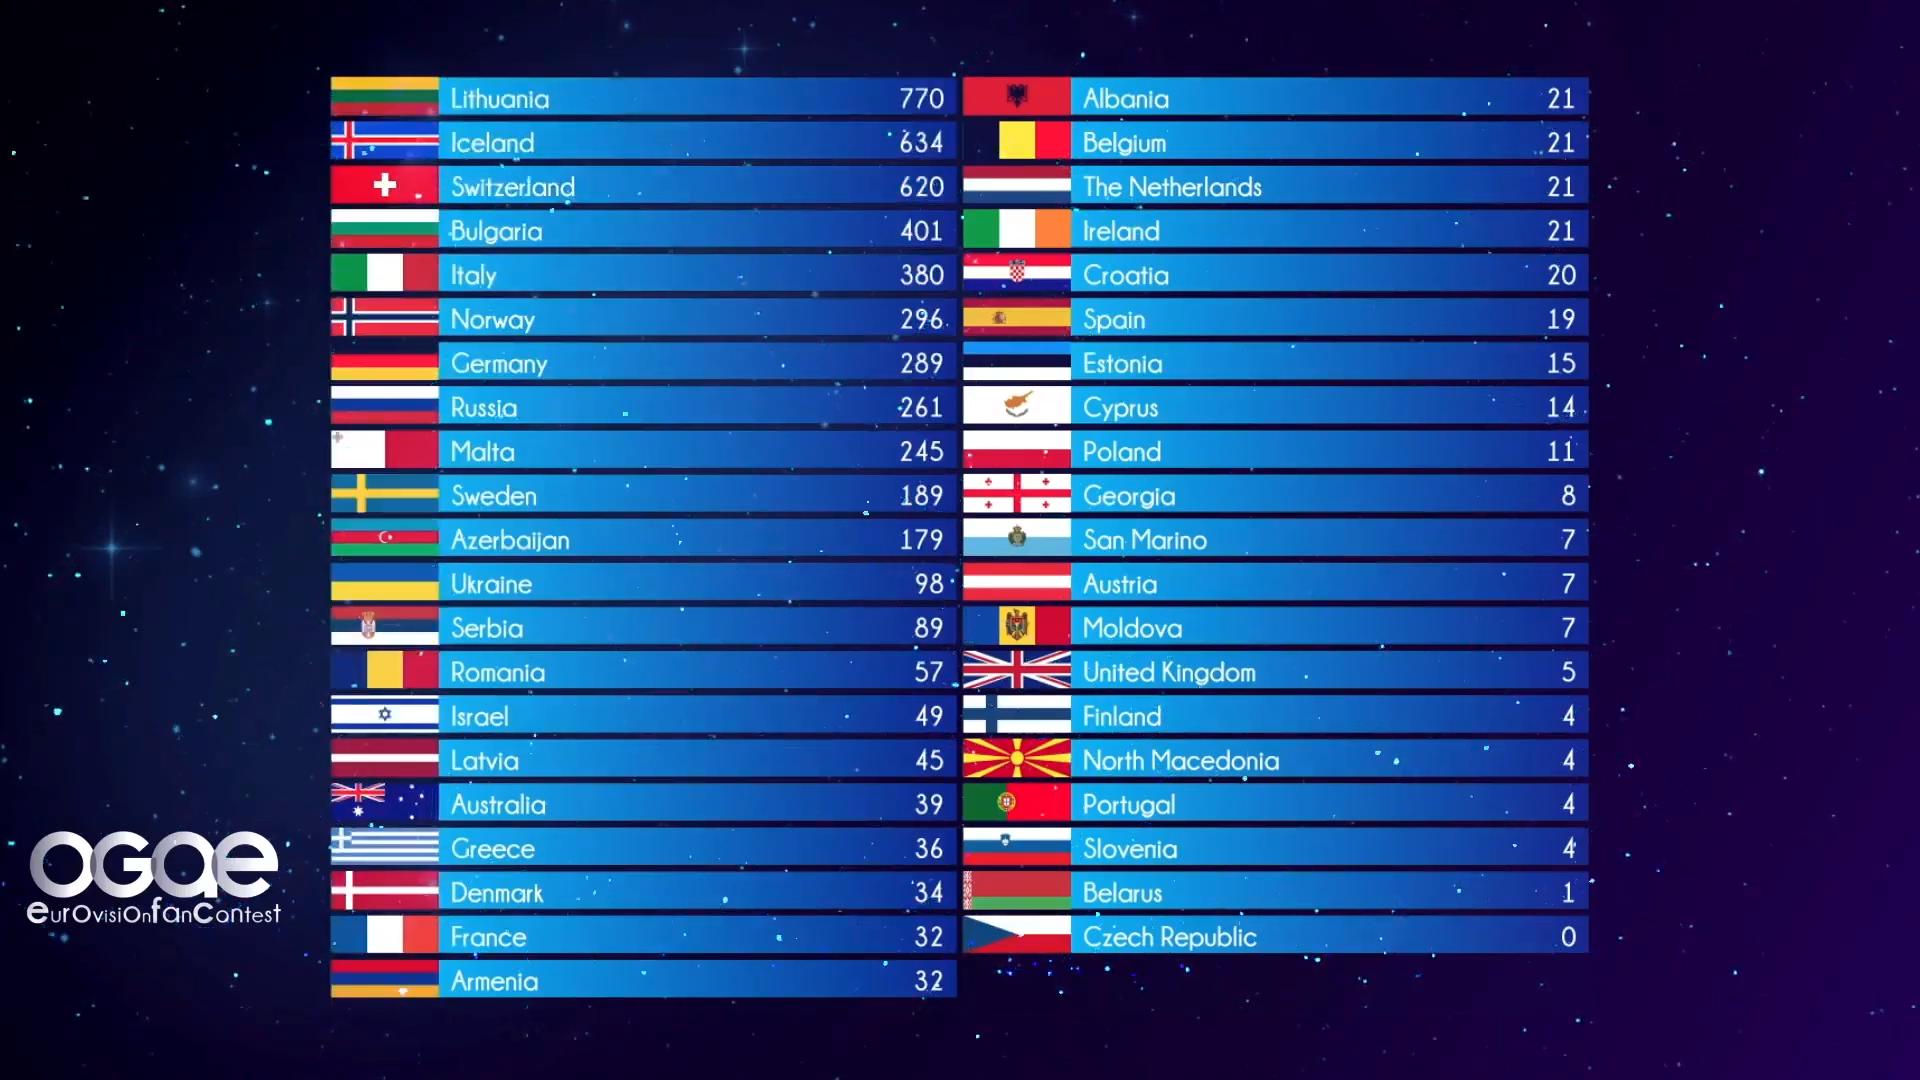 OGAE Eurovision Fan Contest